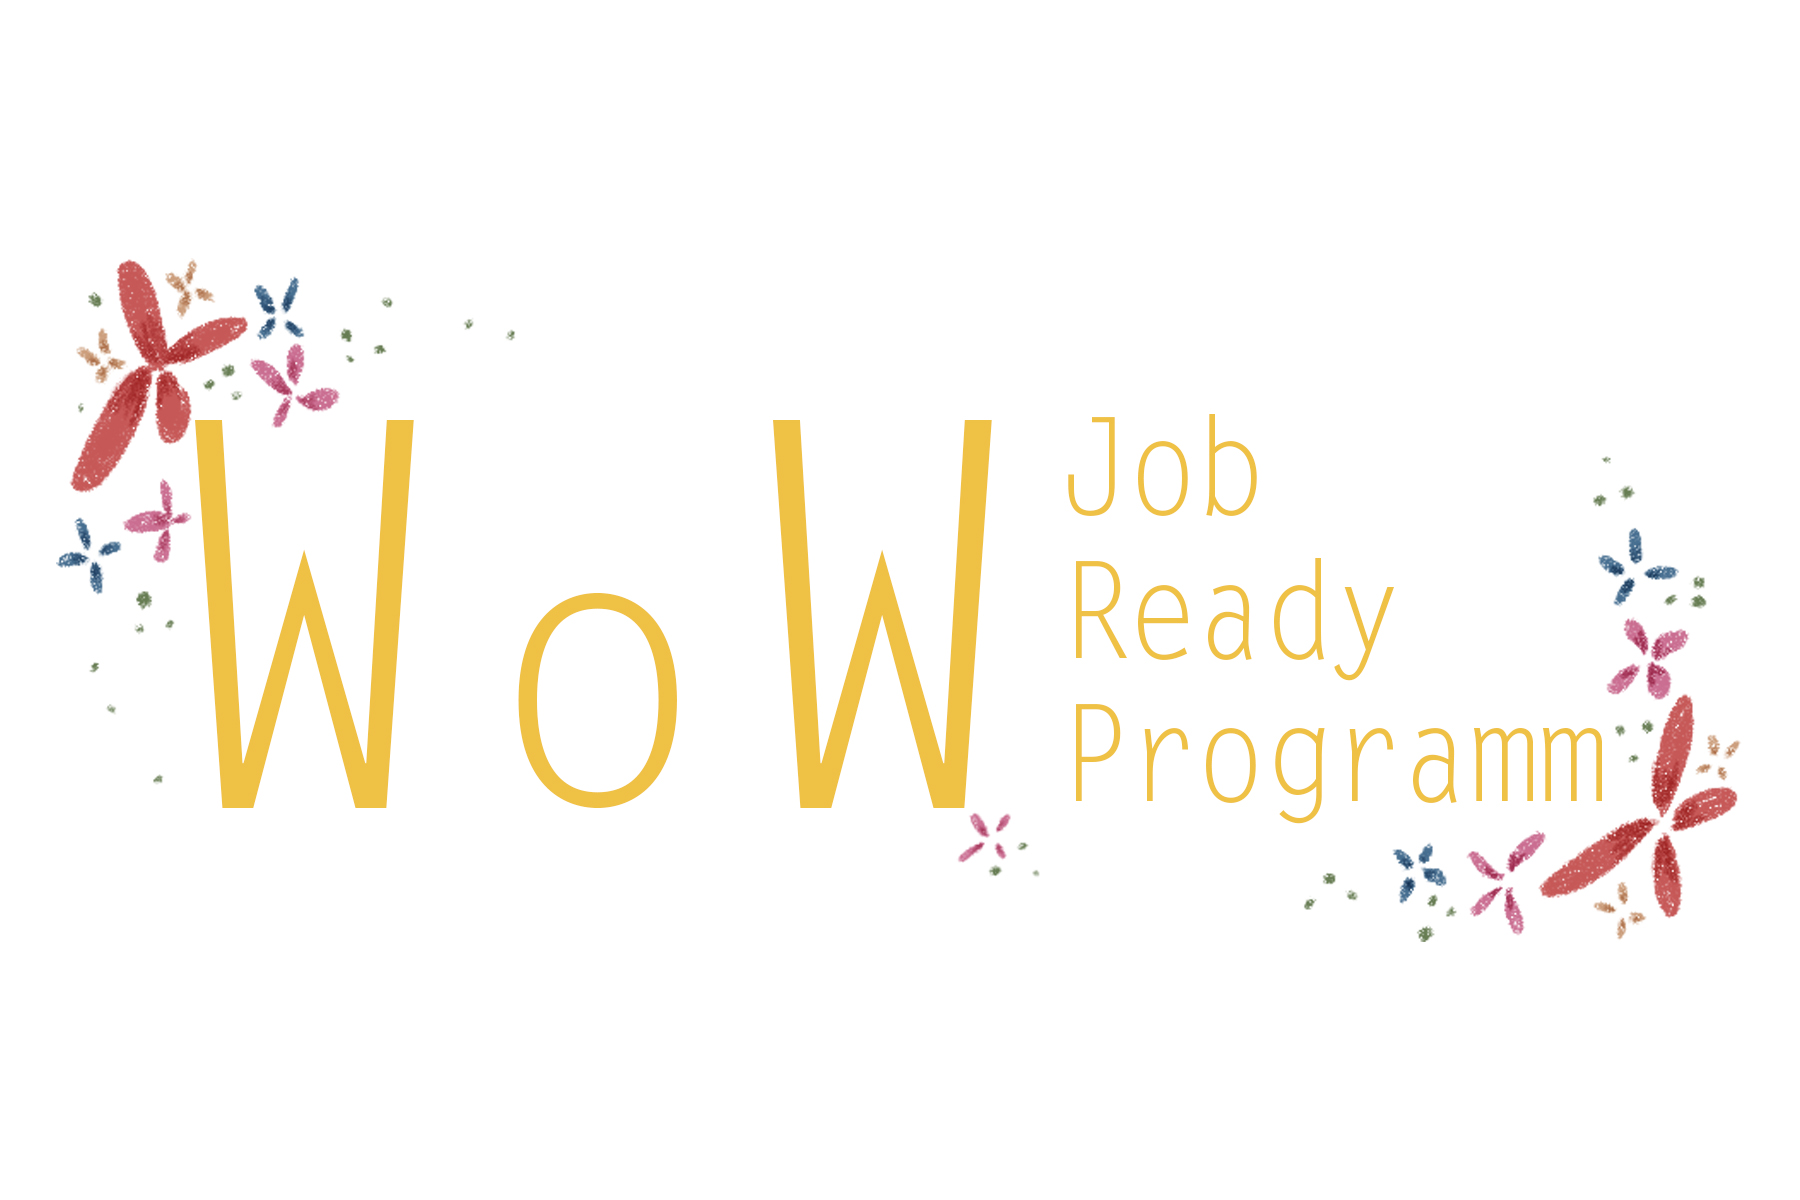 JobReadyProgramm Logo.jpg